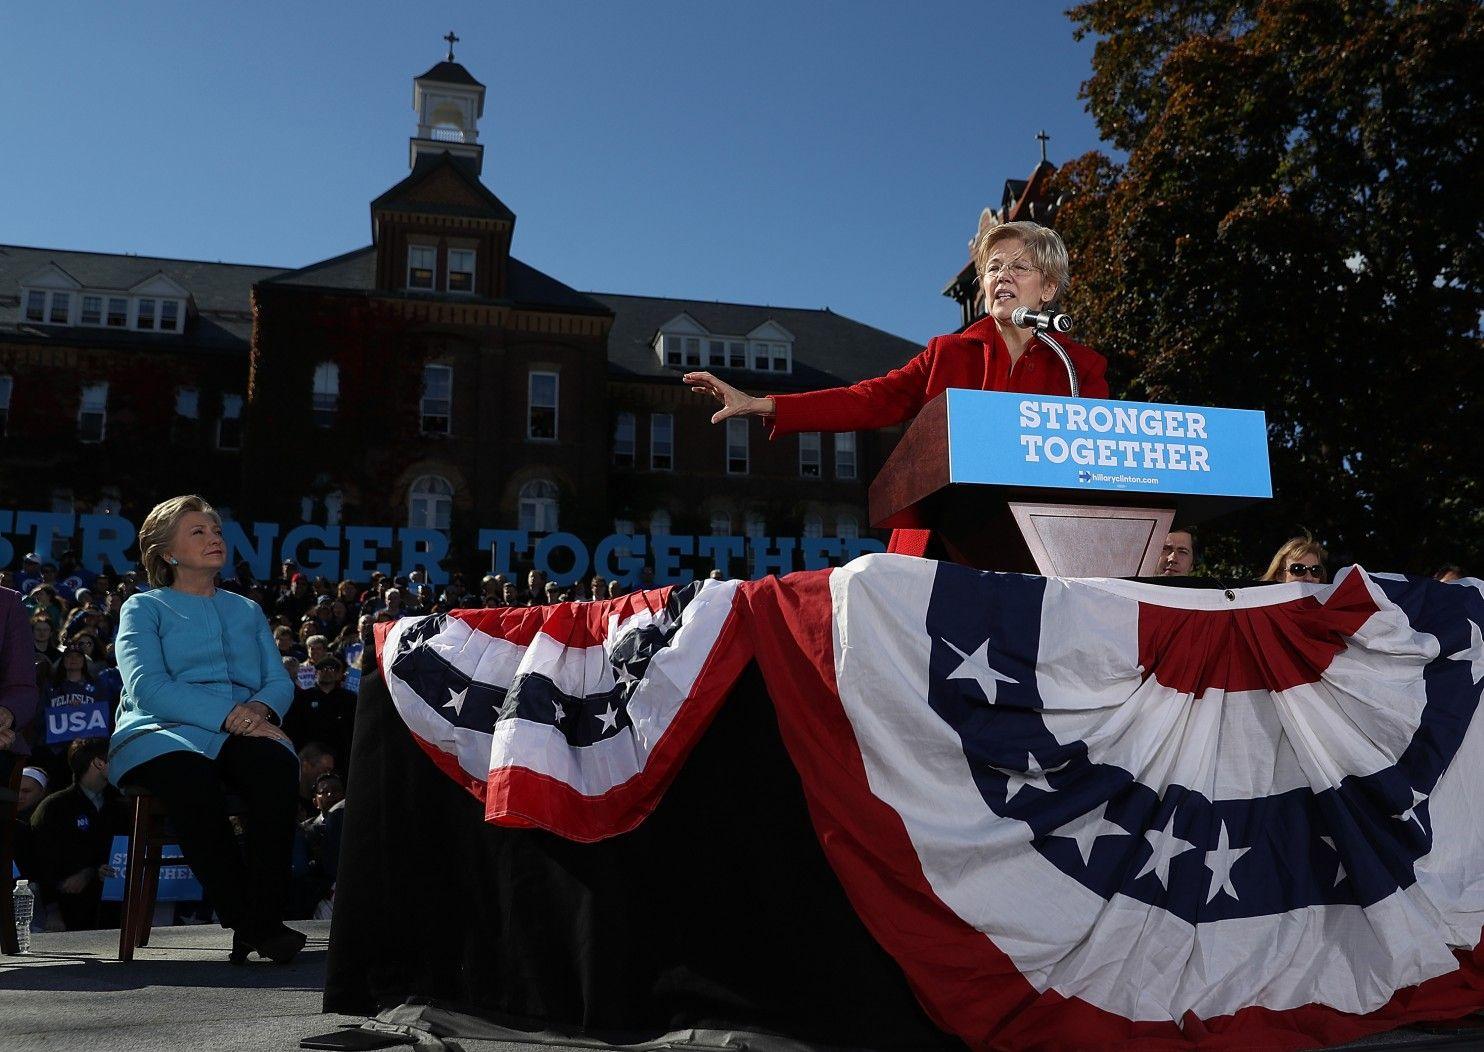 Inside Elizabeth Warren's behind-the-scenes strategy for pressuring Hillary Clinton http://wapo.st/2f4W1zV